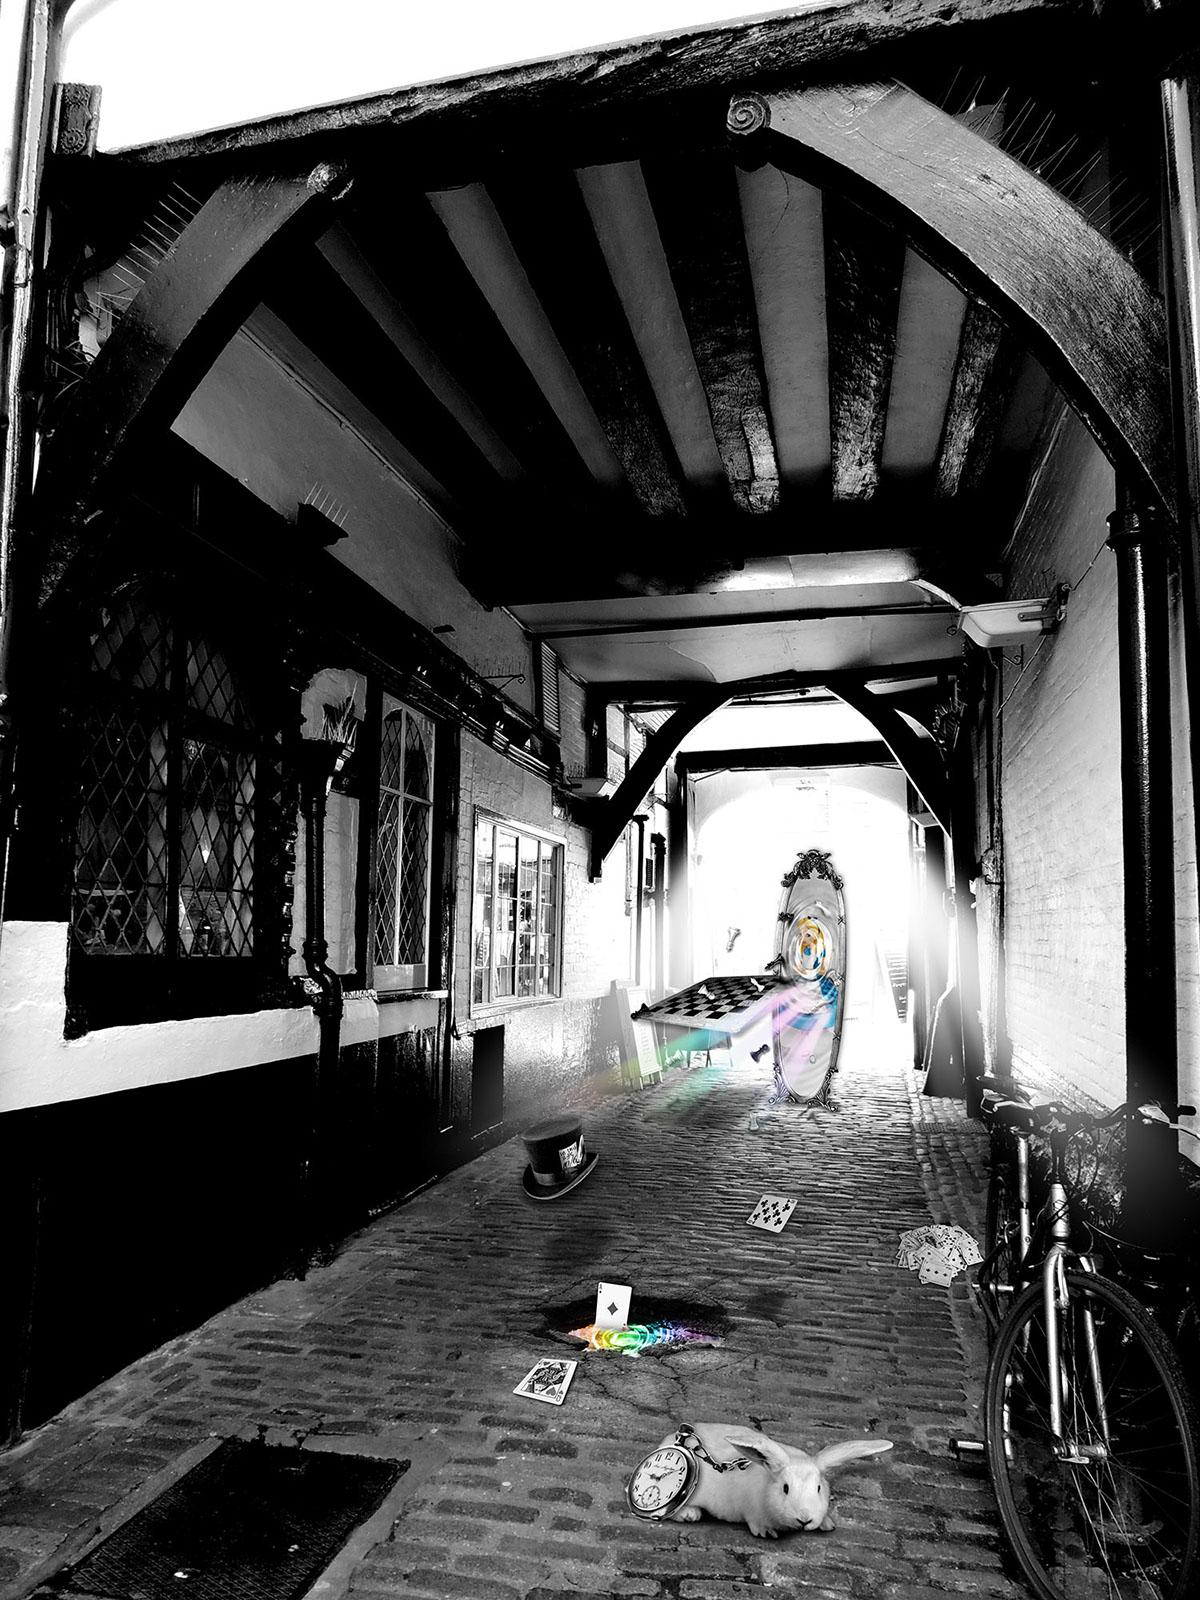 Adobe Portfolio Photo Manipulation  alice in wonderland Guildford Digital Art  Composite